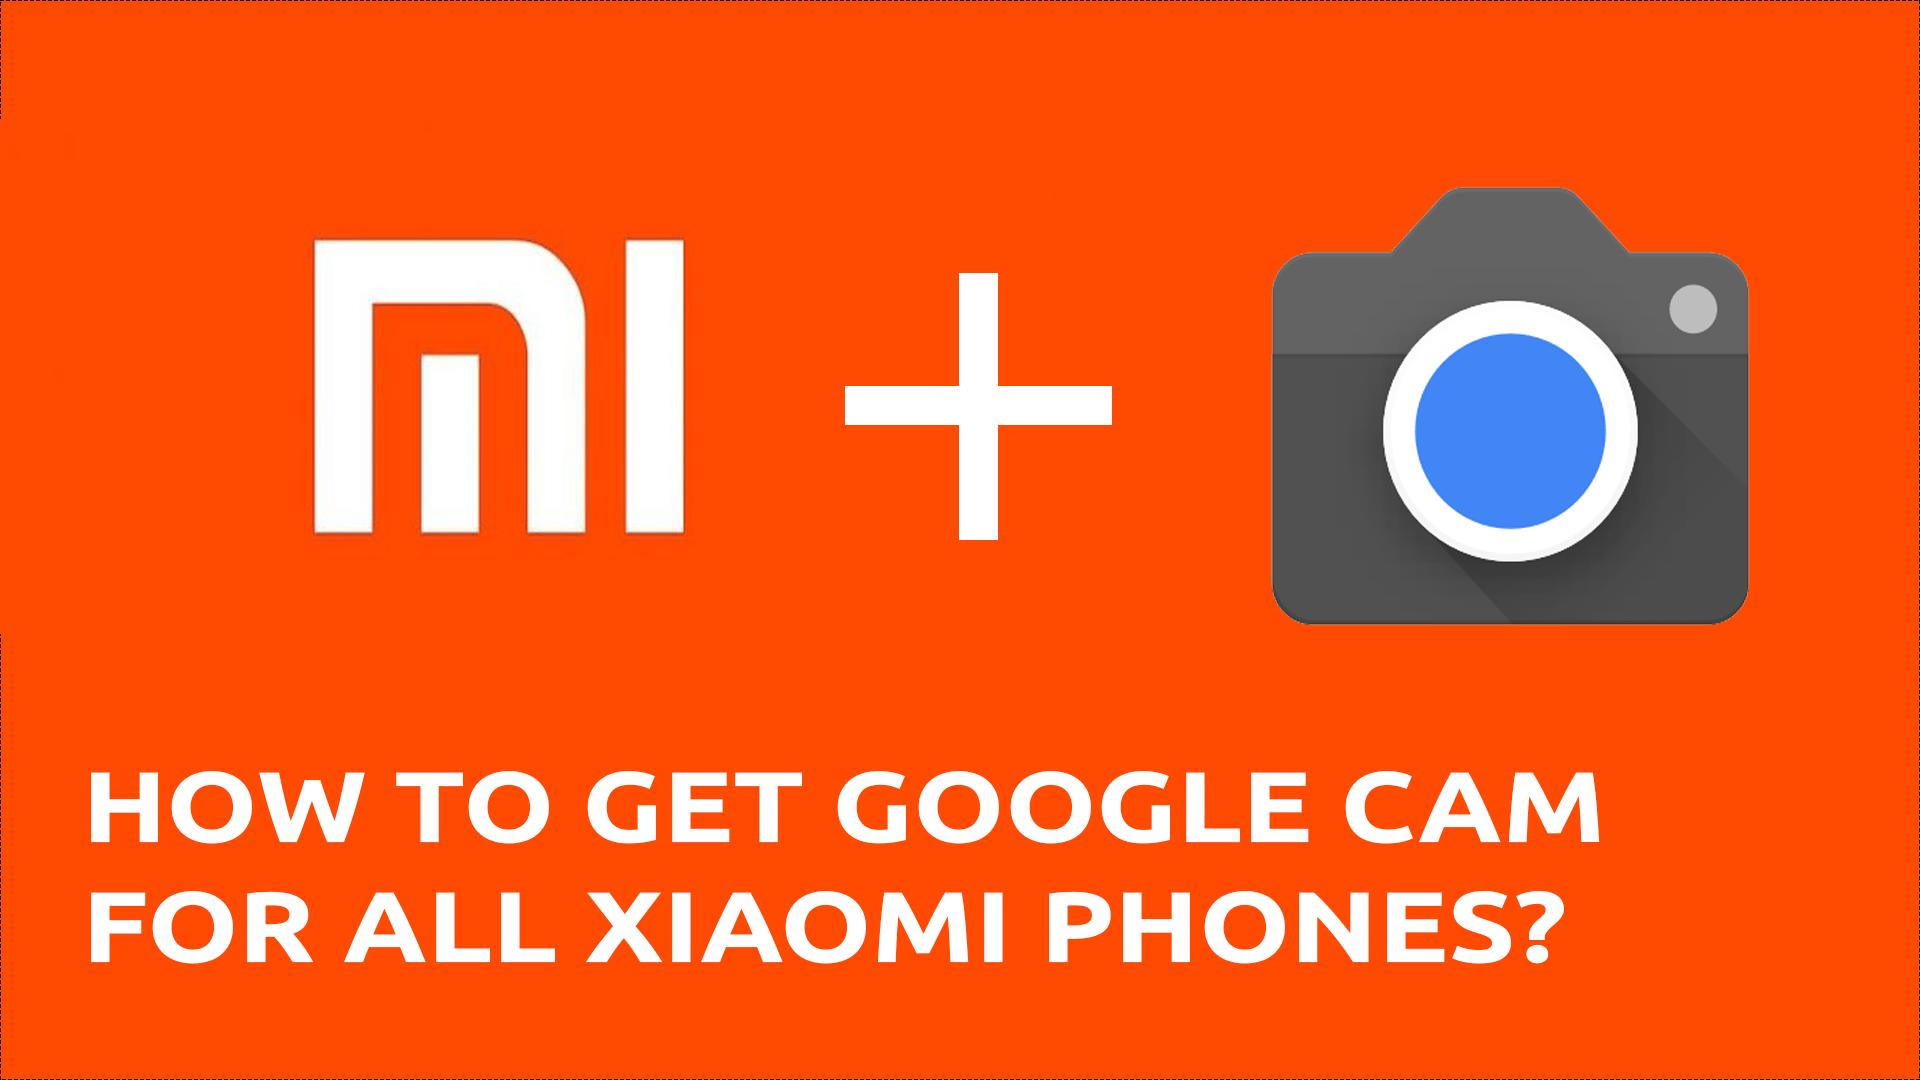 How to Install Google Camera in Xiaomi Smartphones?